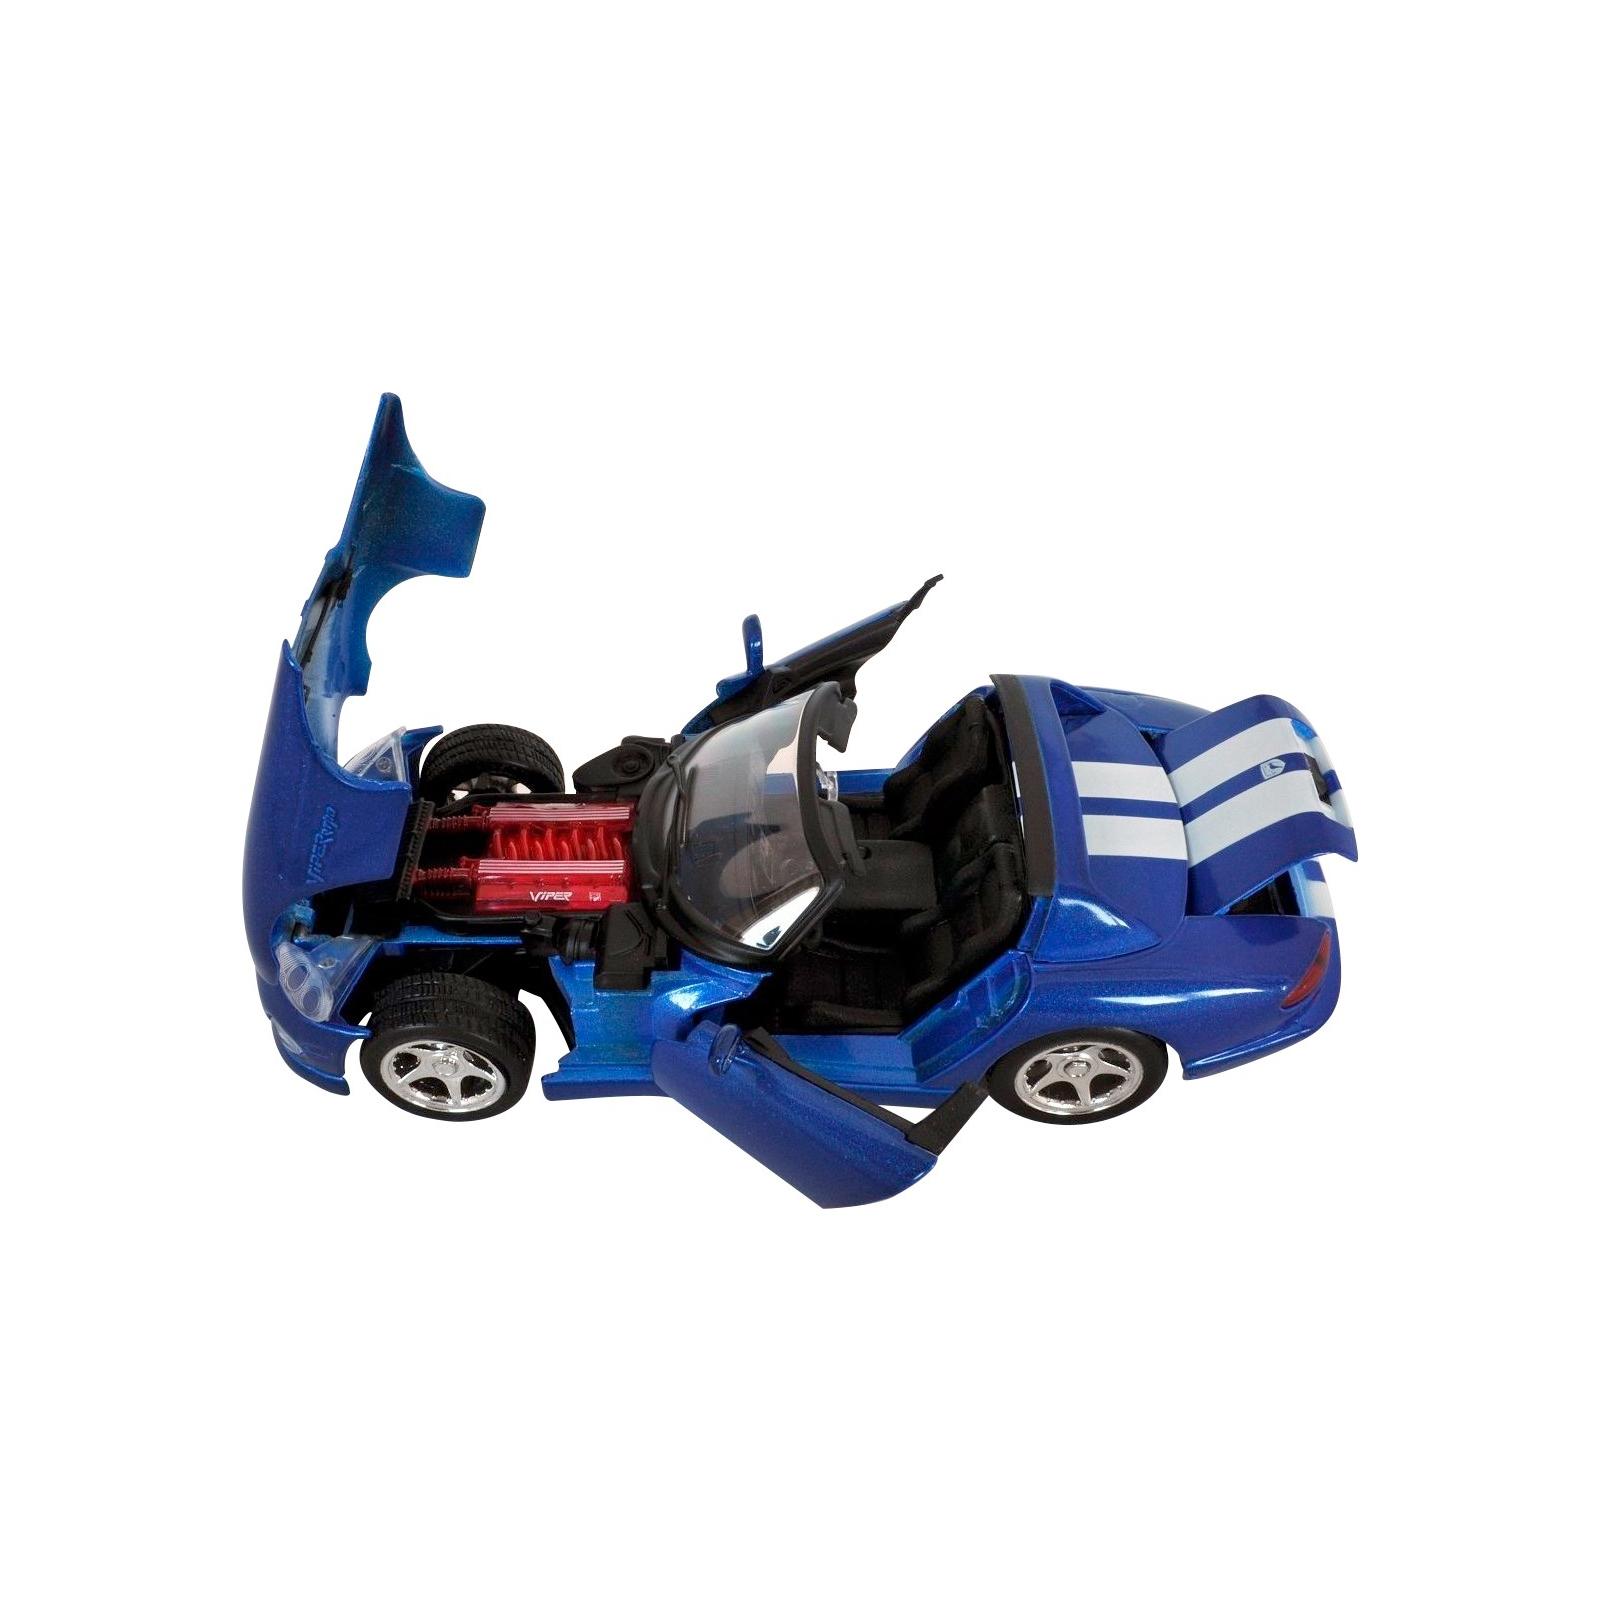 Машина Maisto Dodge Viper RT/10 '97 (1:24) синий (31932 blue) изображение 3